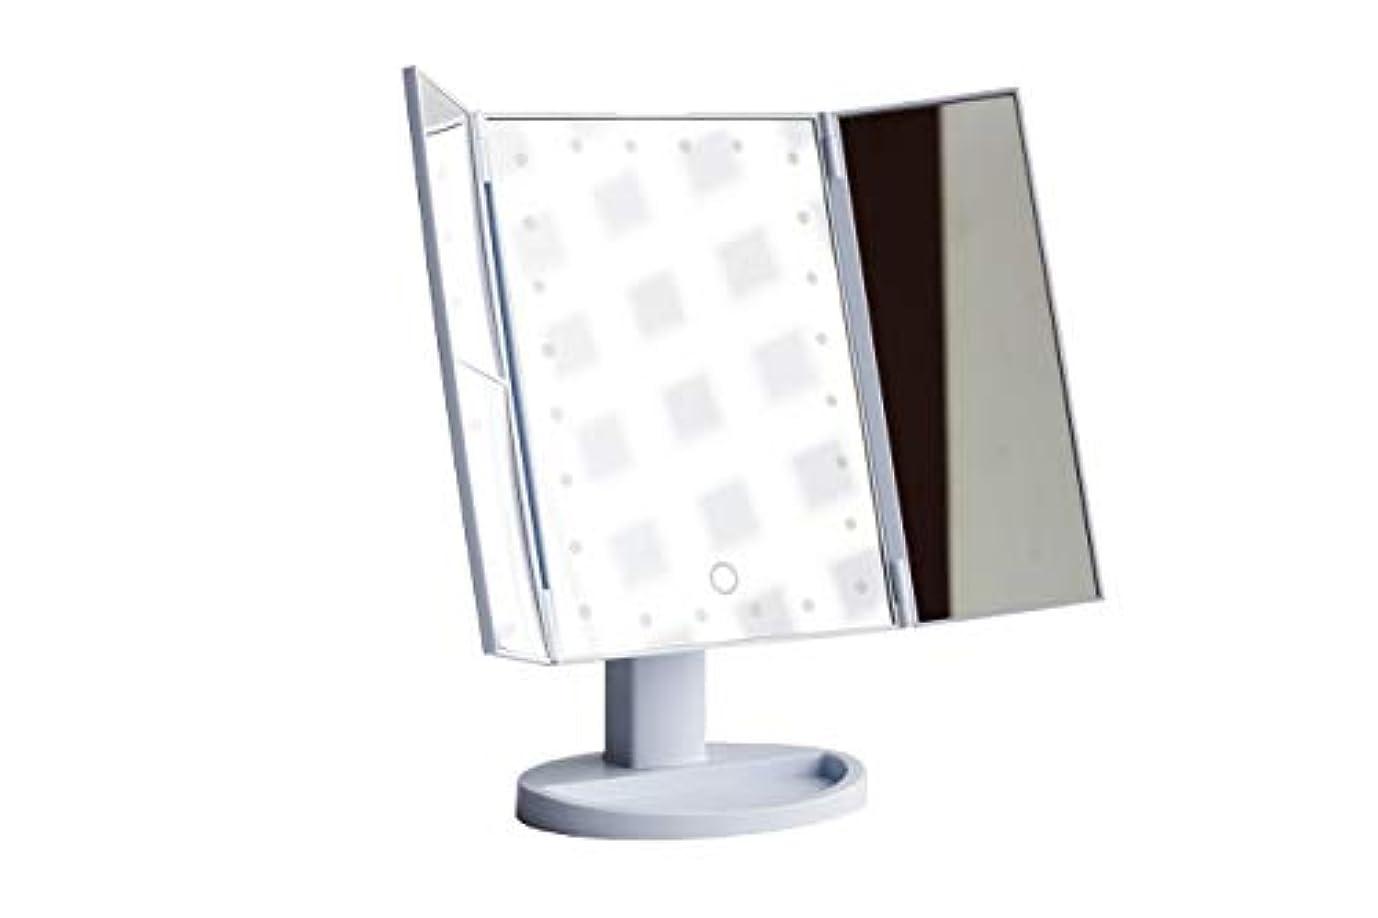 Grace & Stella LEDライト メイクアップミラー 化粧鏡 鏡 三面鏡 卓上 24のLEDライト 折りたたみ 拡大鏡機能(2倍?3倍?10倍)USB電源コード(バッテリー機能付き2WAY給電)携帯可能